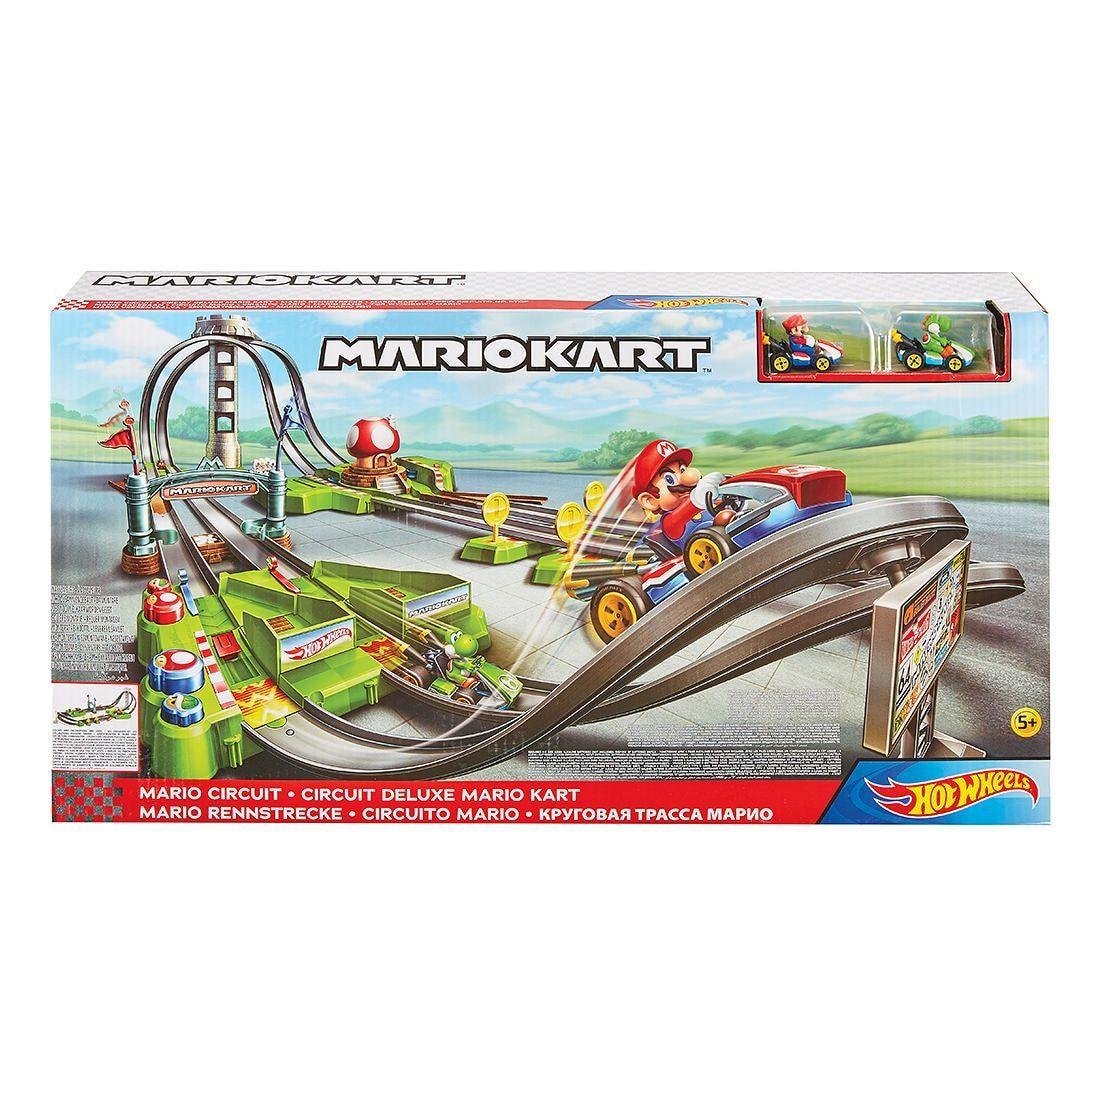 Hot Wheels Mario Kart Circuit Track Set Target Australia Hot Wheels Mattel Hot Wheels Hot Wheels Track